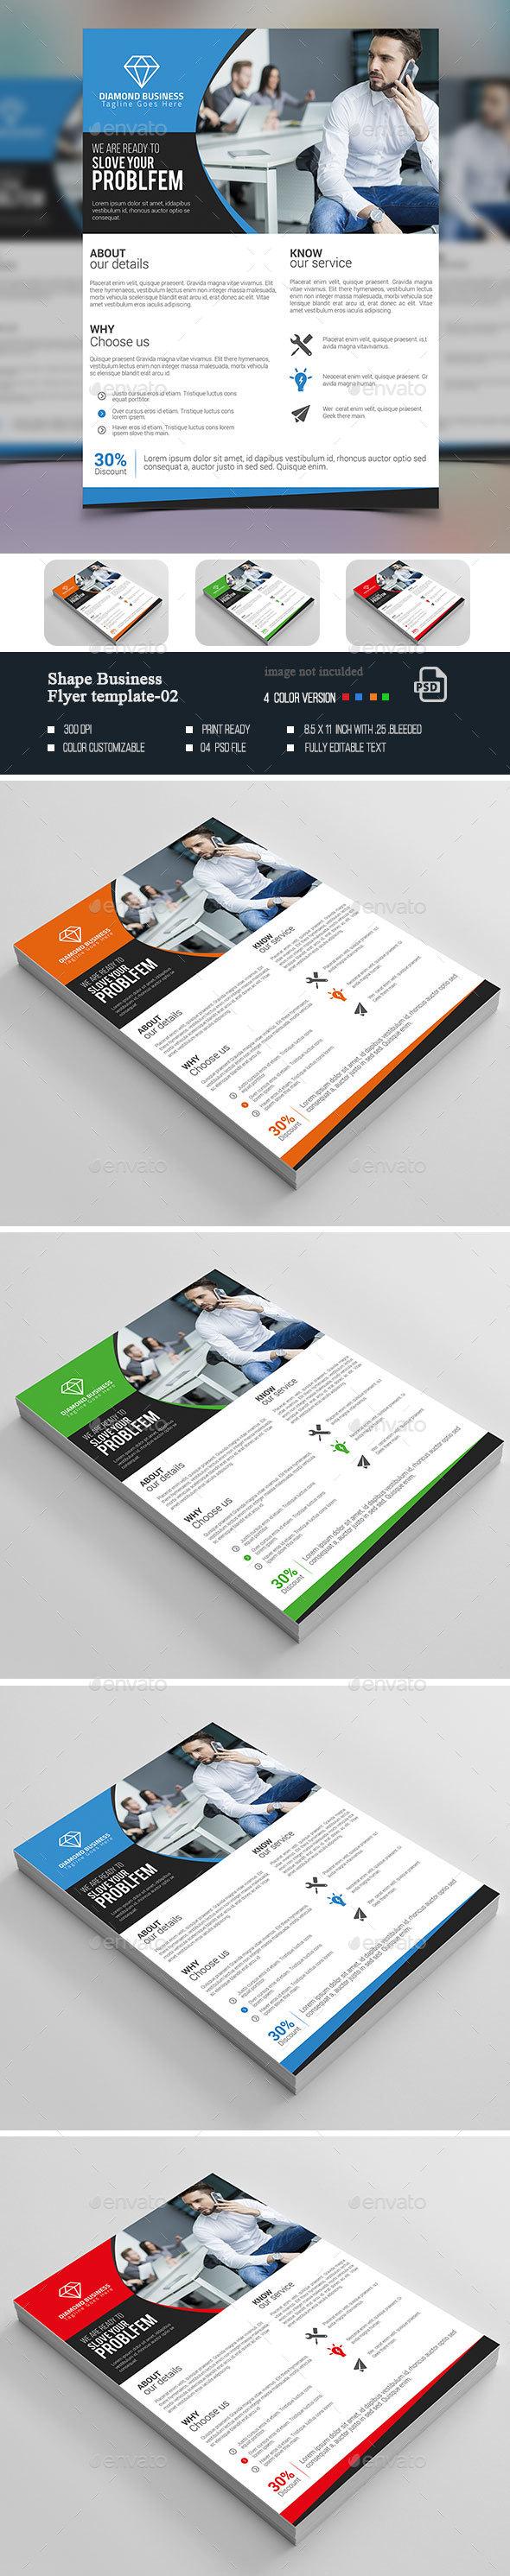 Shape Business Flyer-02 - Corporate Flyers